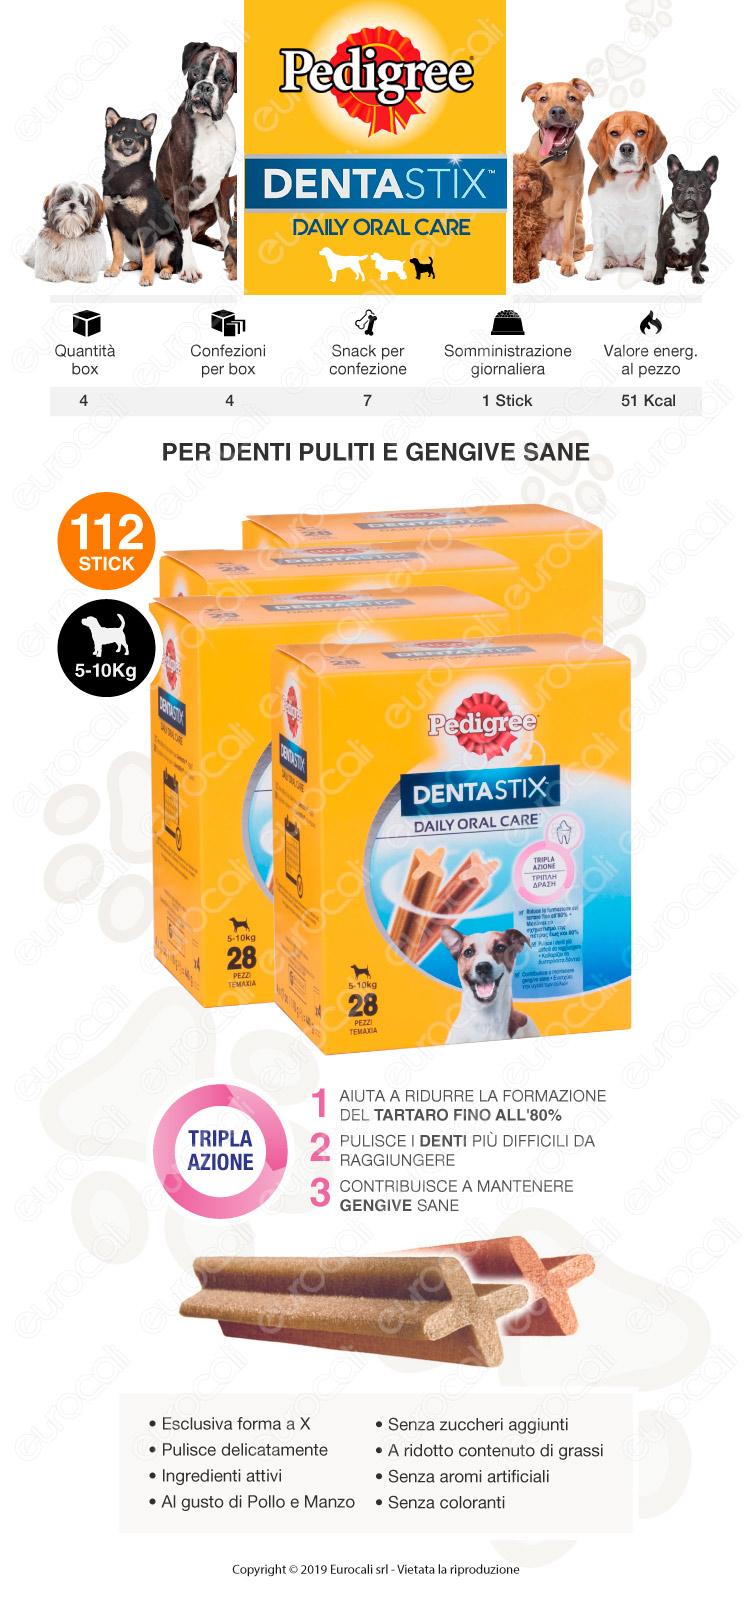 pedigree dentastix medium 112 sticks